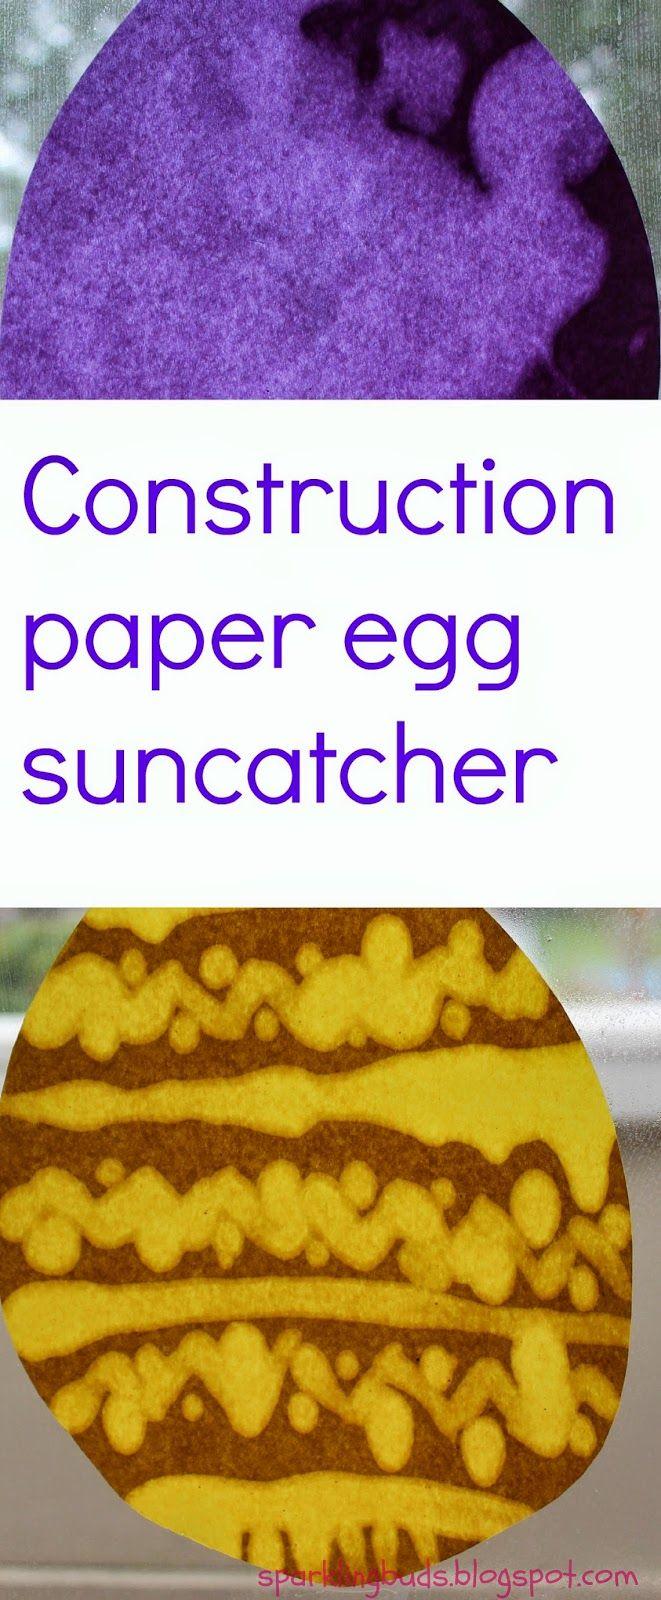 Construction paper egg suncatcher - Sparkling Buds